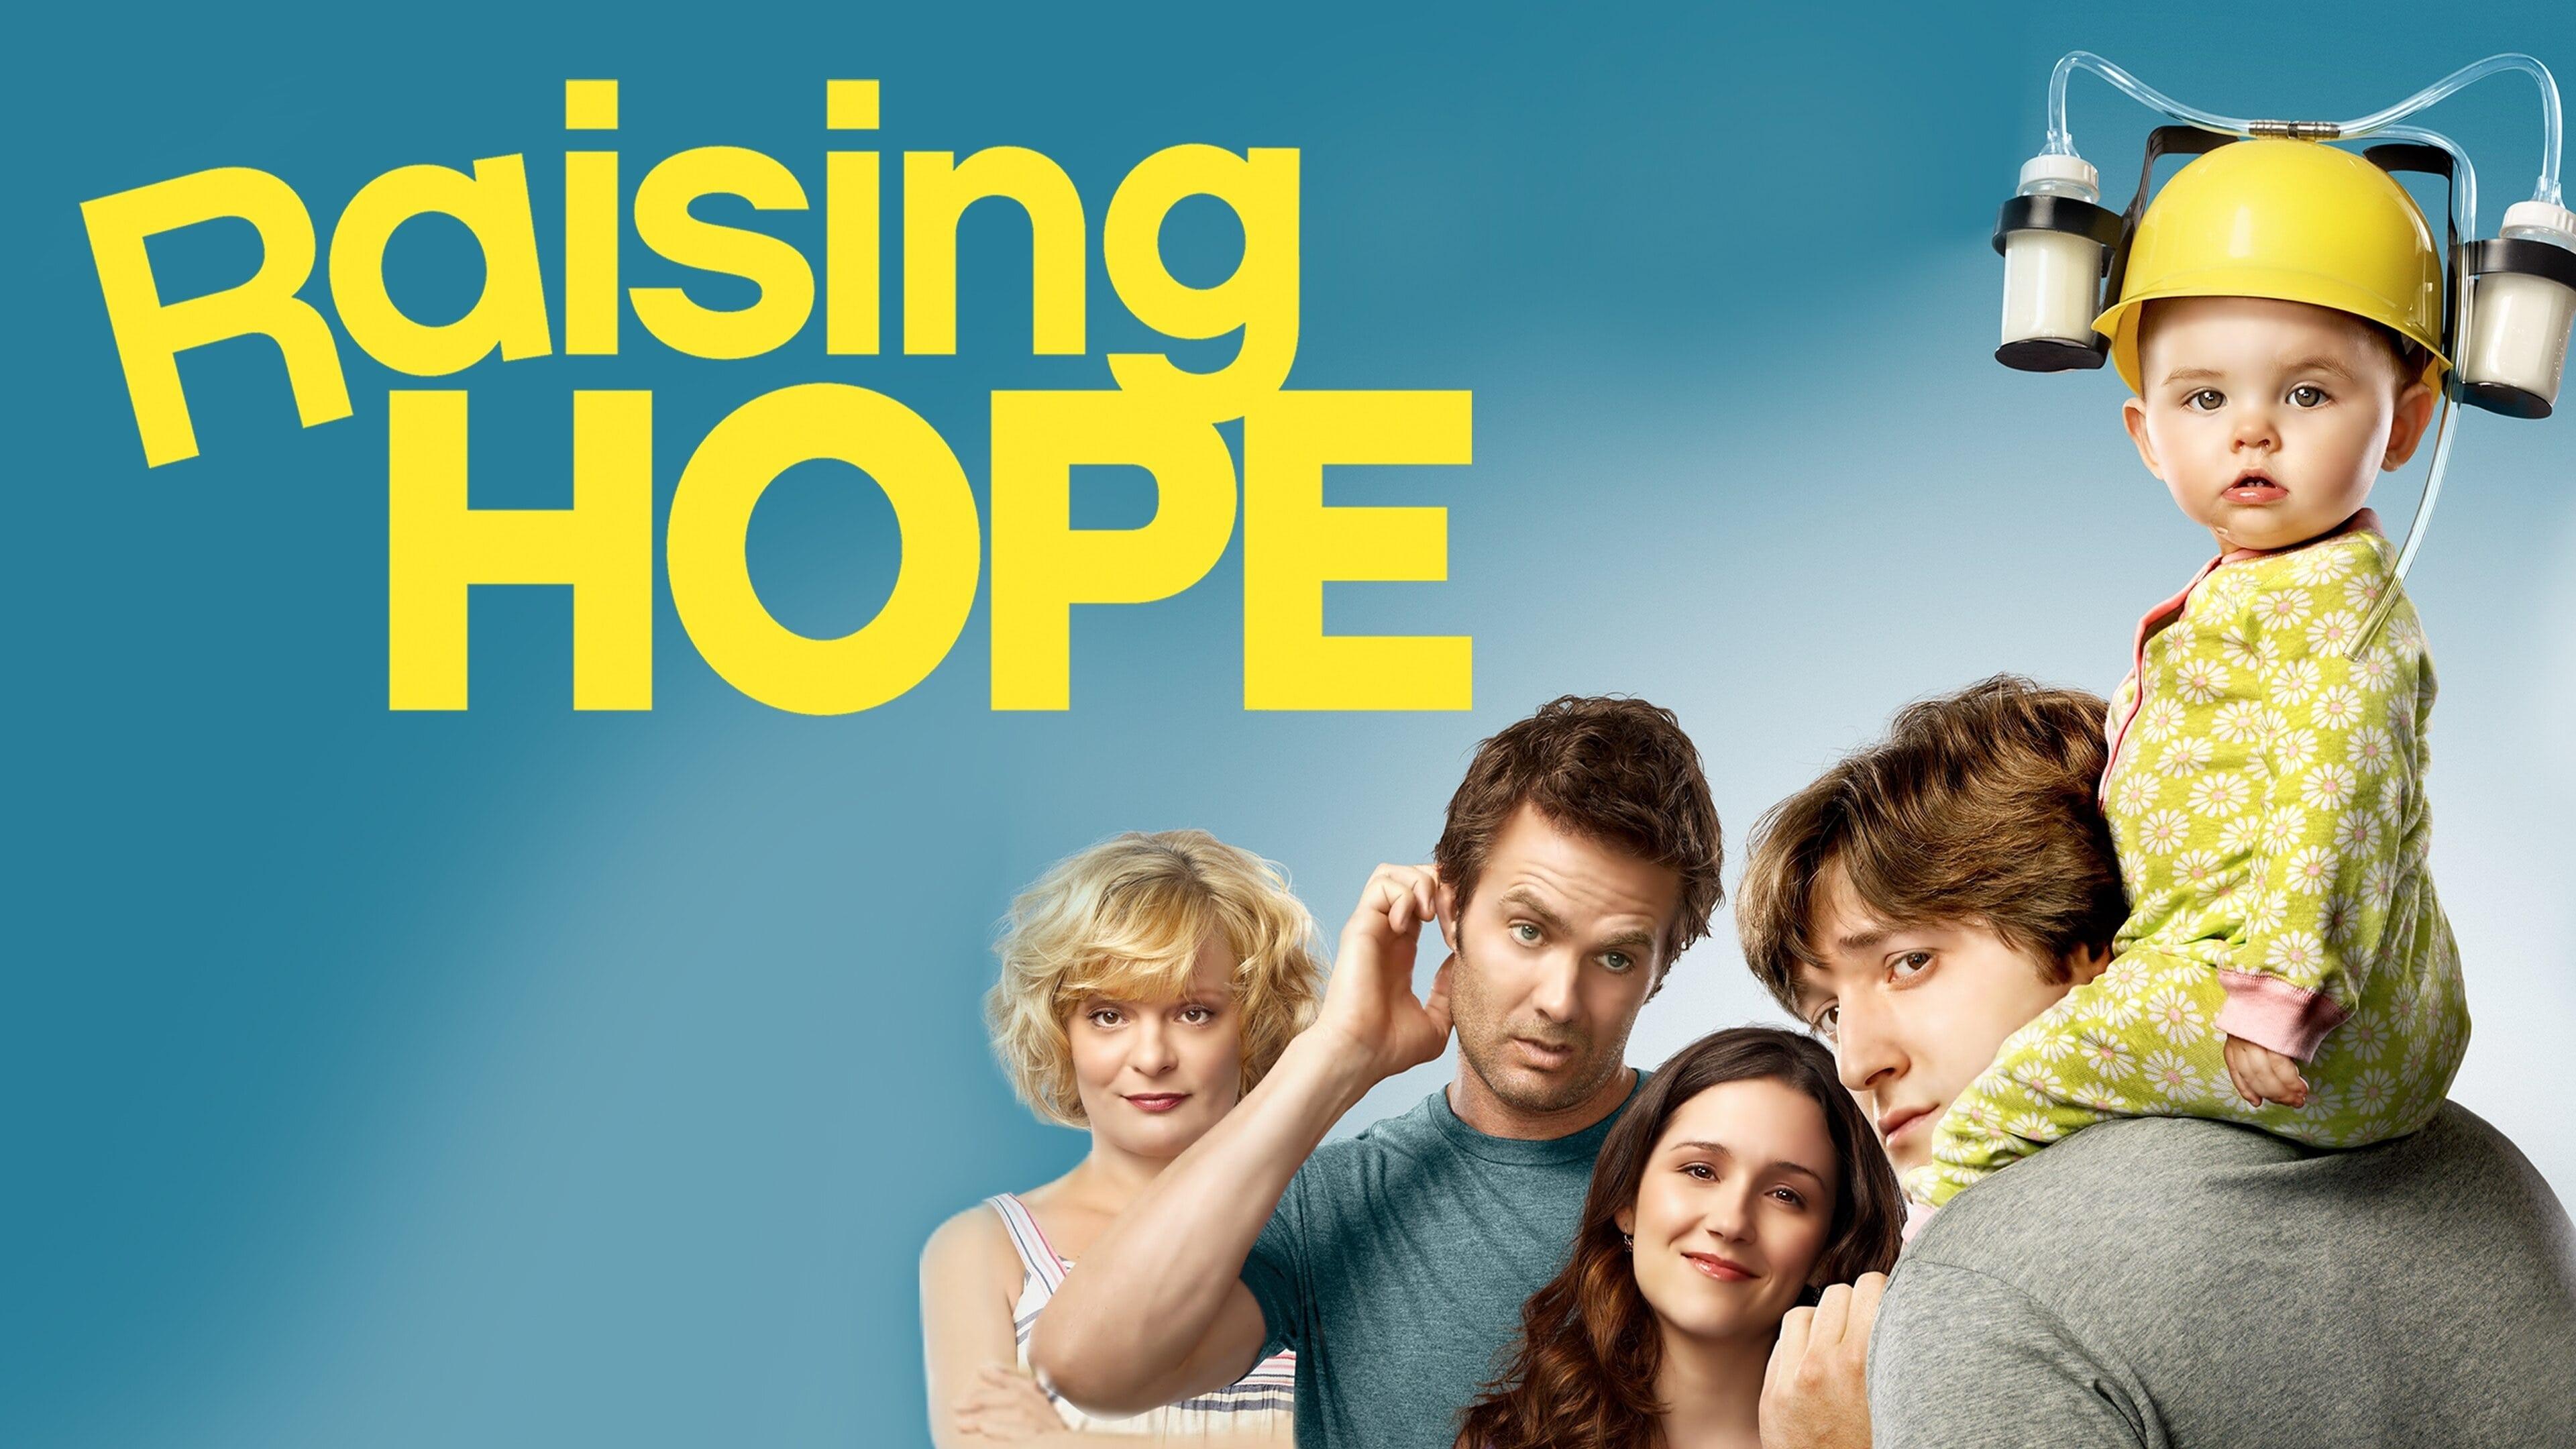 'Raising Hope' cancelled